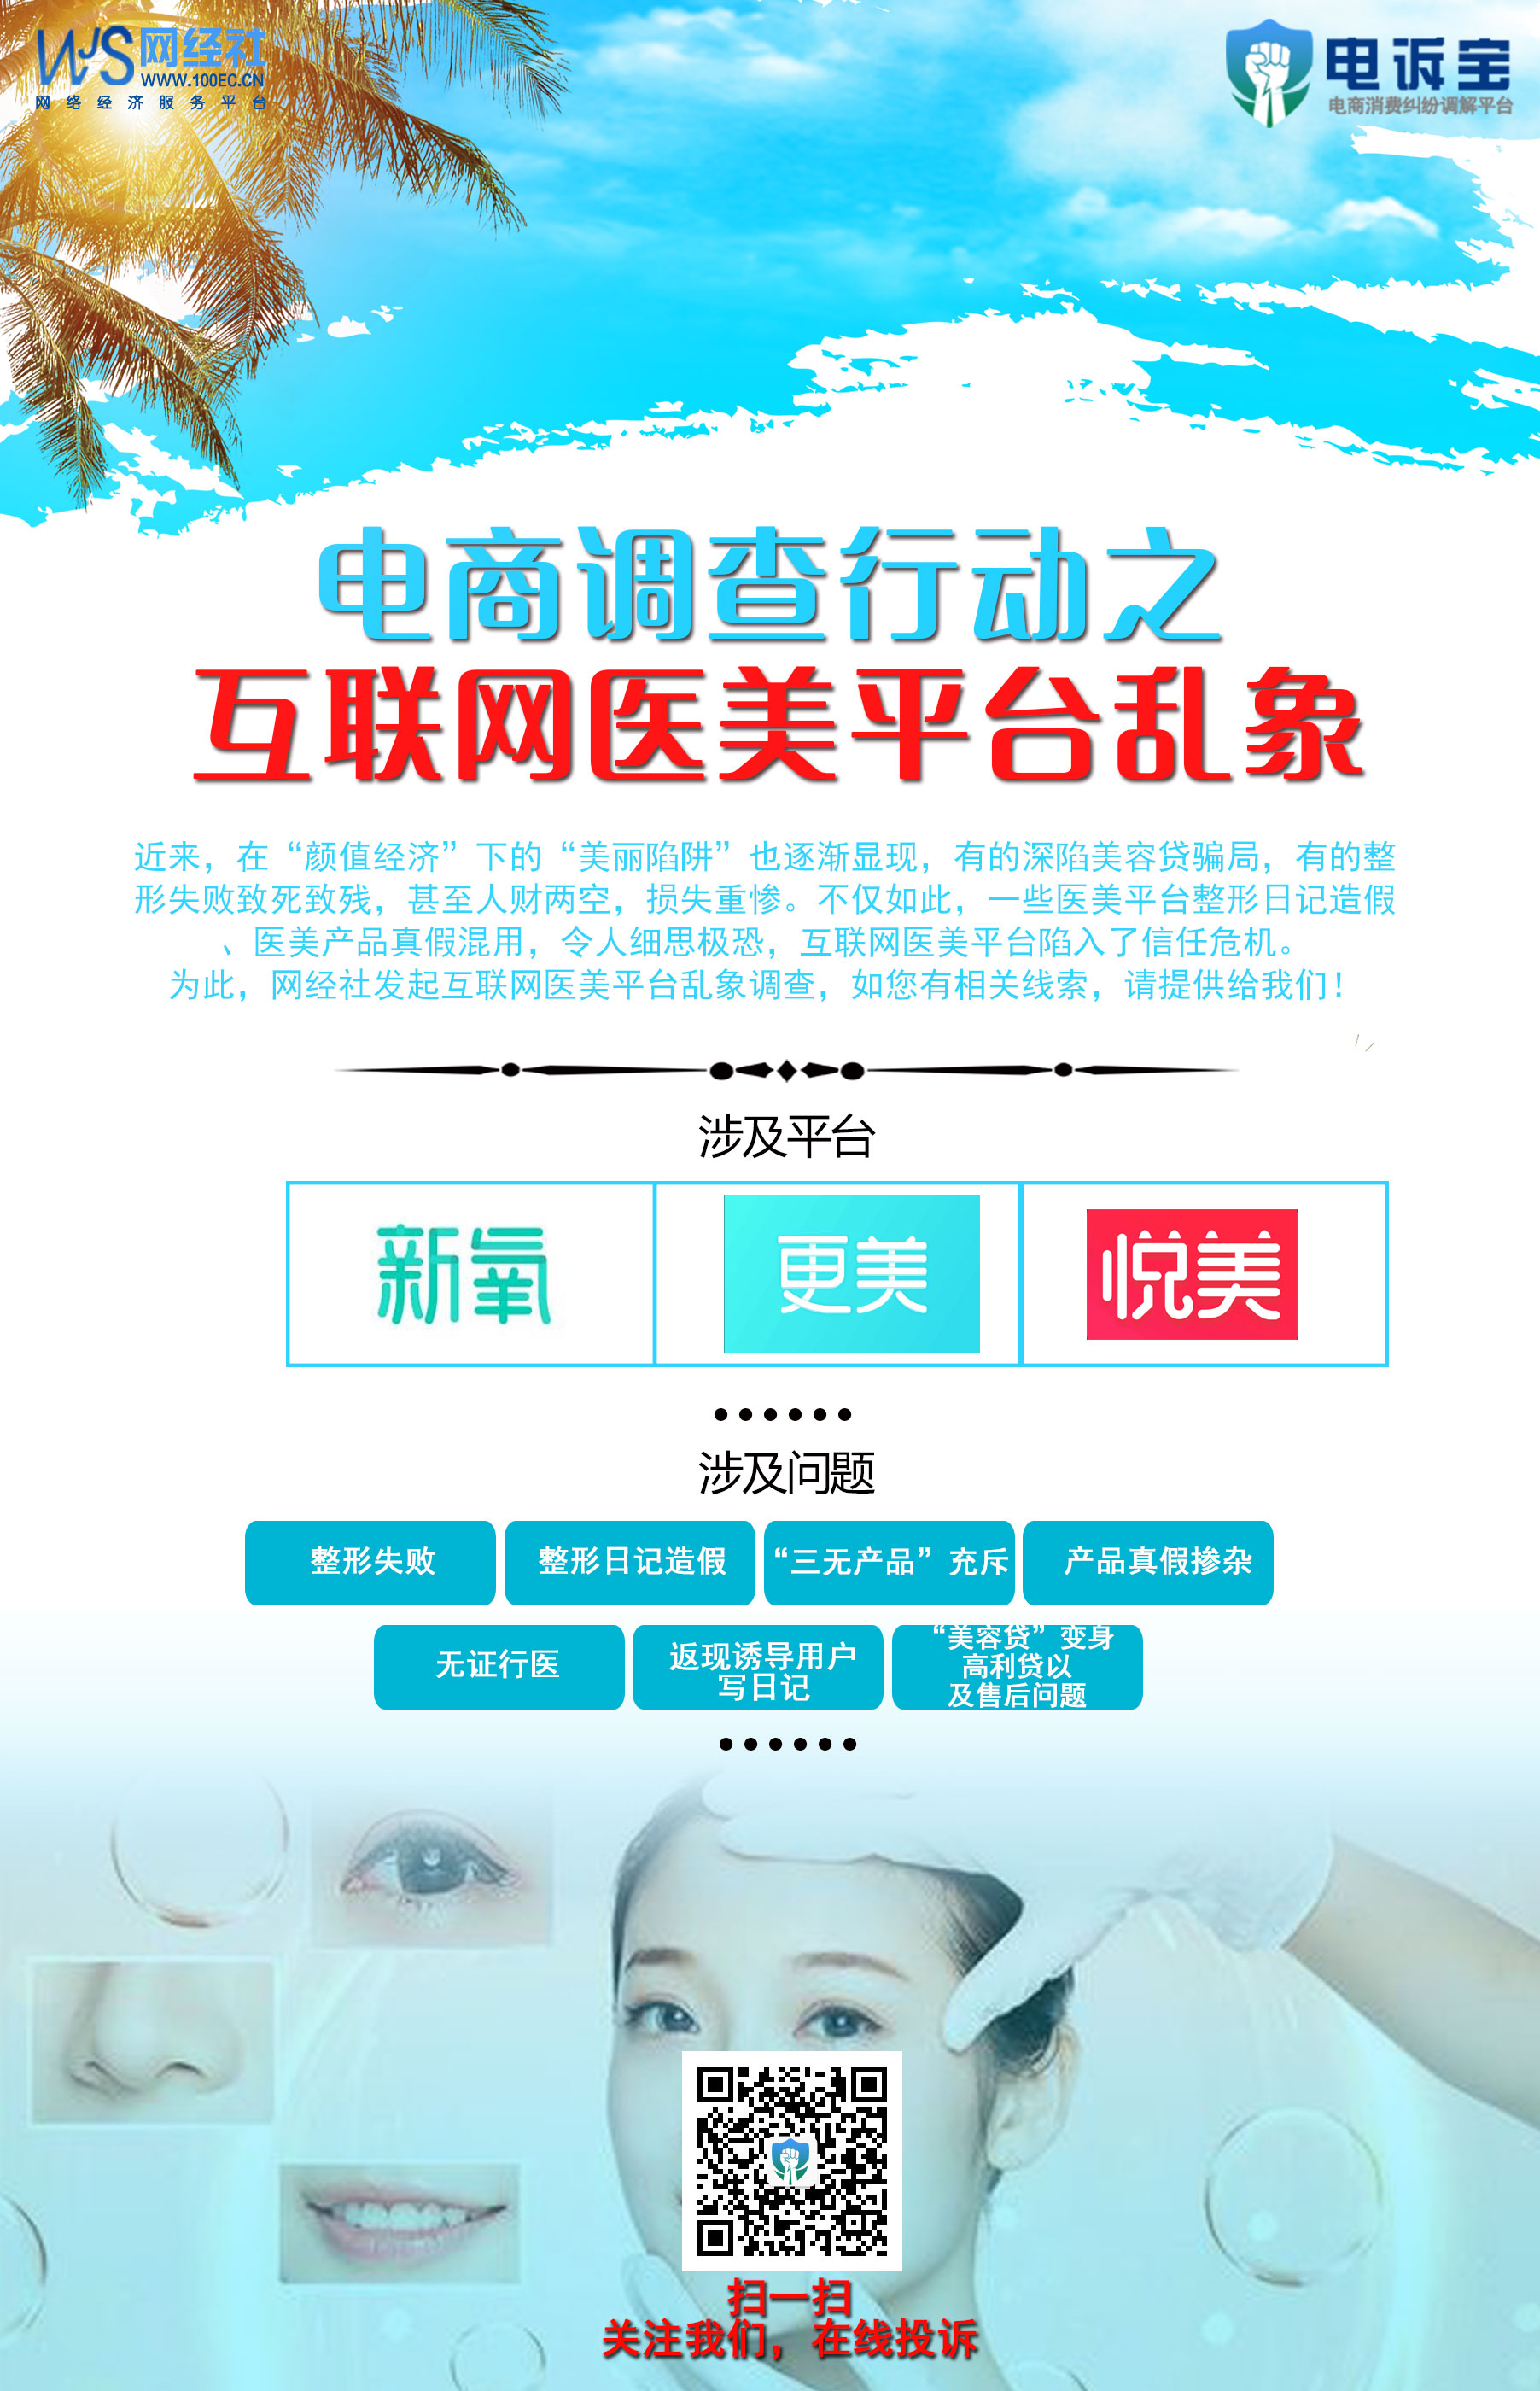 http://www.100ec.cn/Public/Upload/image/20200821/1598002941910874.png